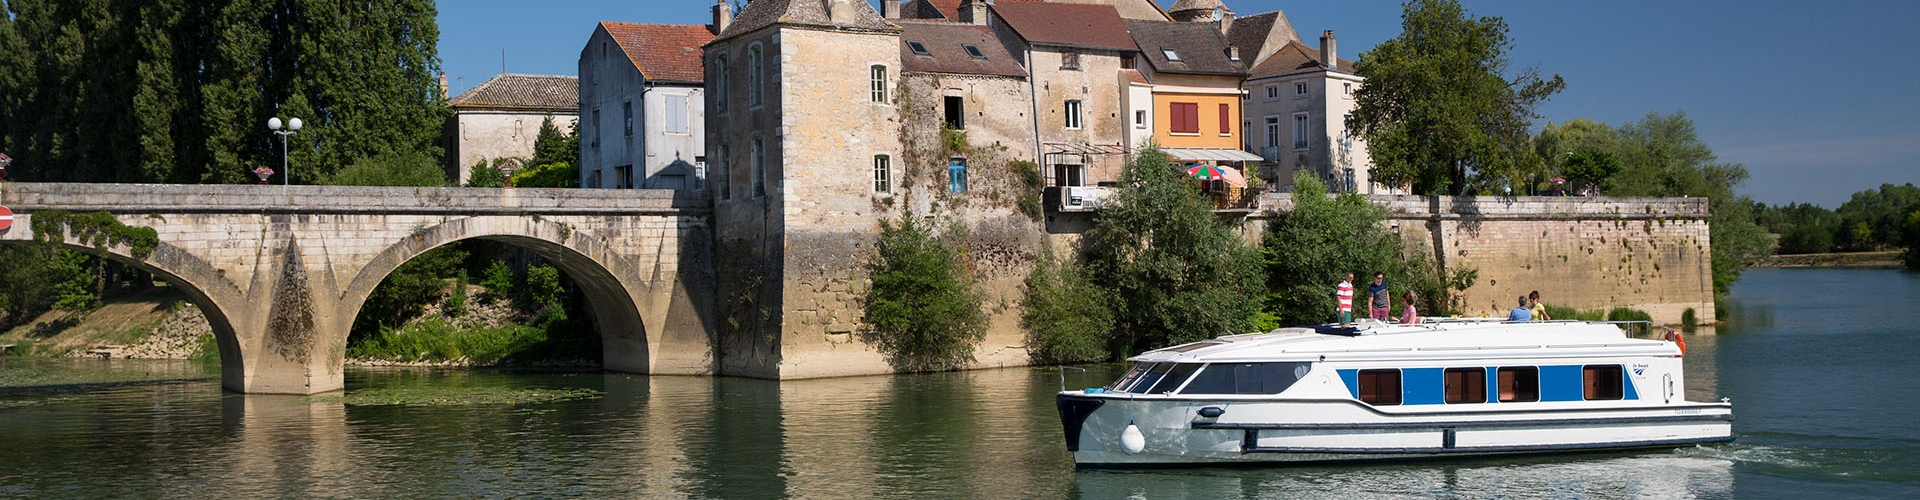 Rivierboot Vision in Bourgondië